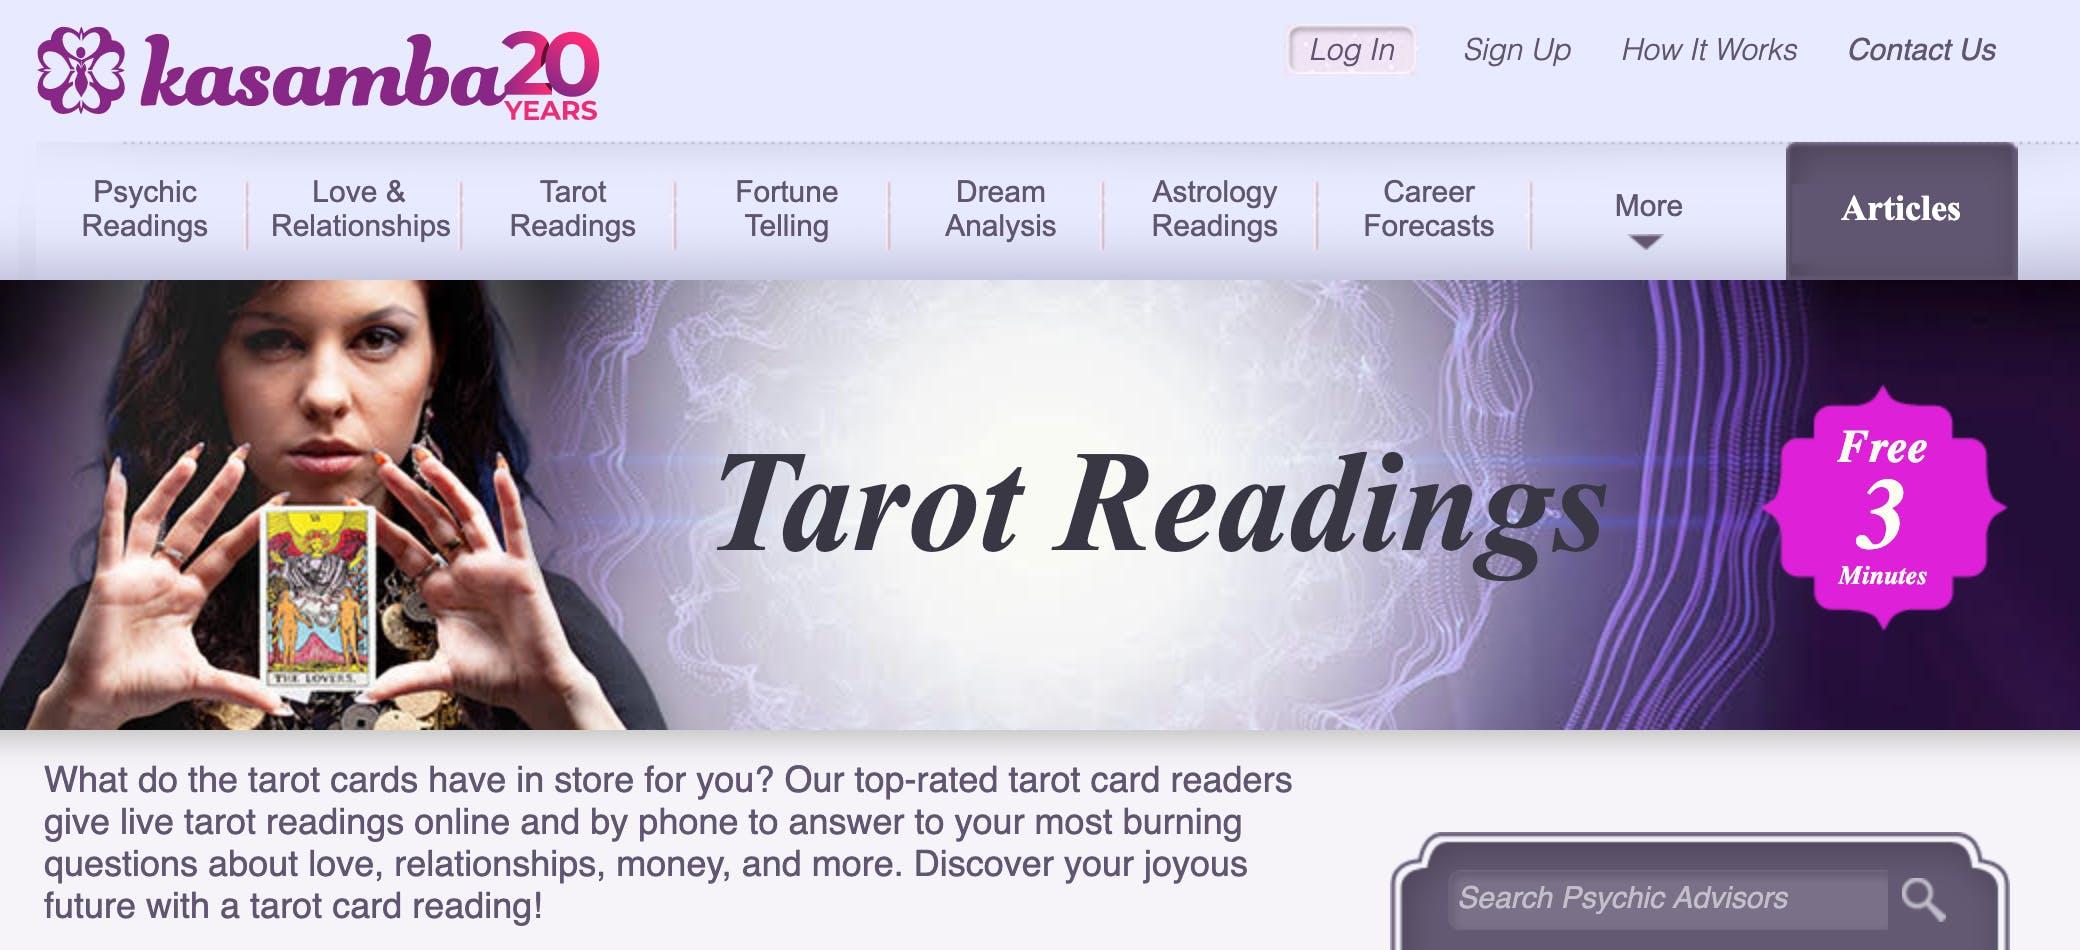 Kasmaba's tarot reading homepage